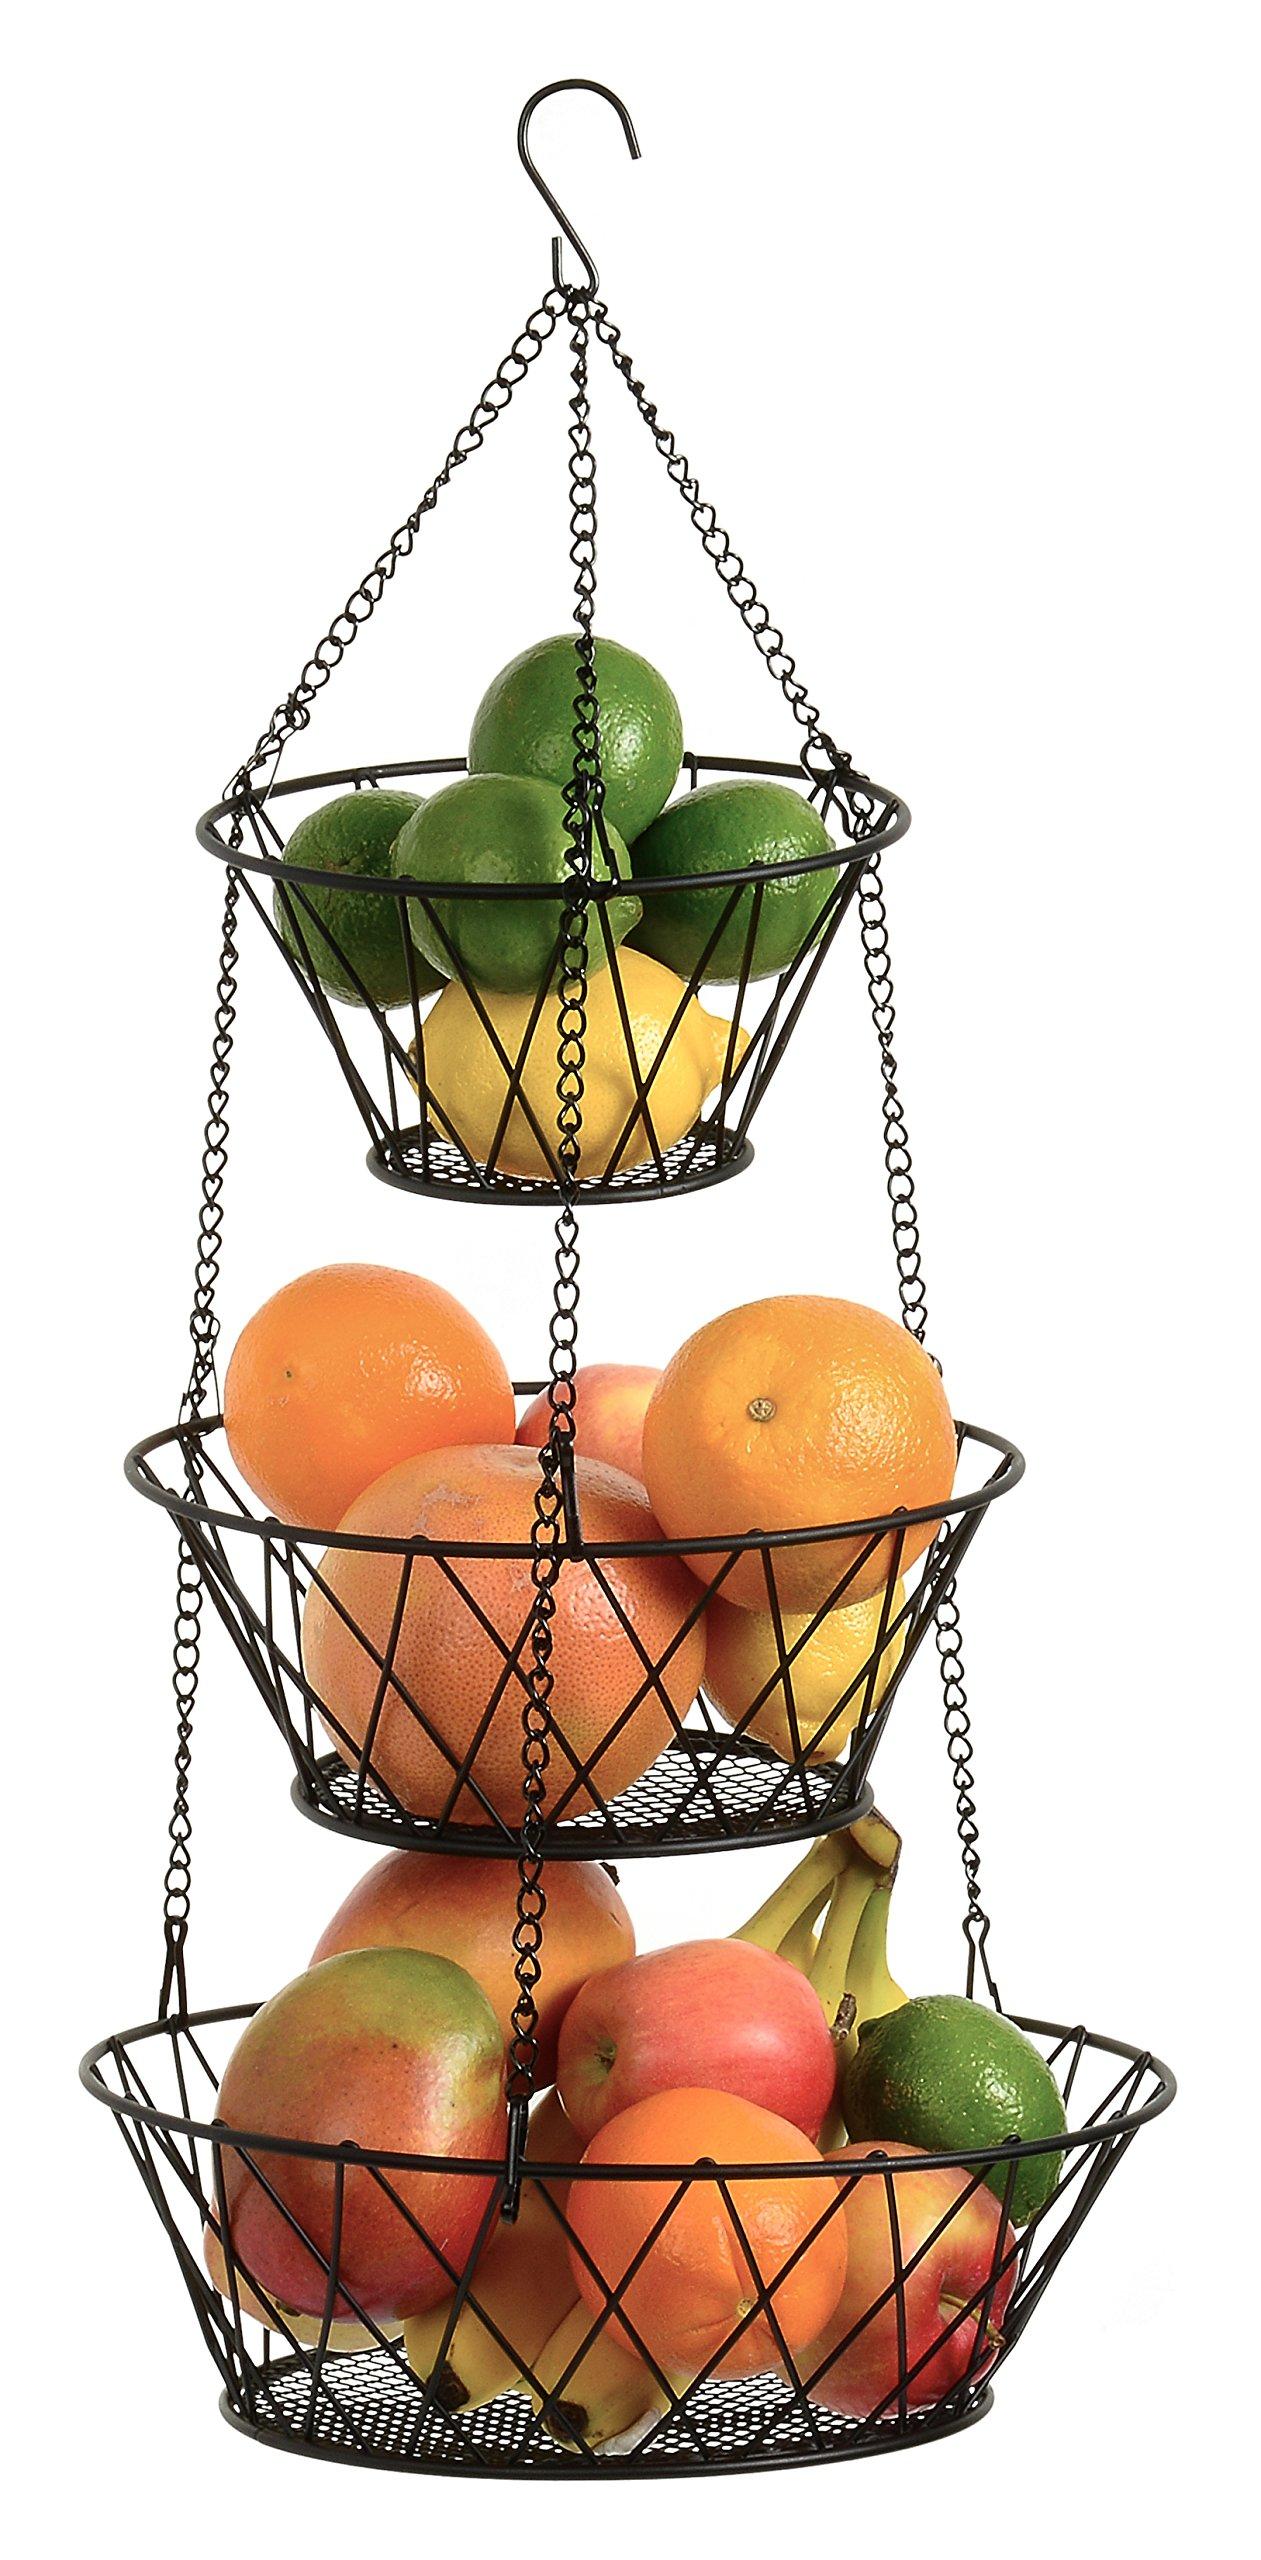 Hanging Fruit Basket 3 Tier, For Kitchen, Black, 25 Inches Long